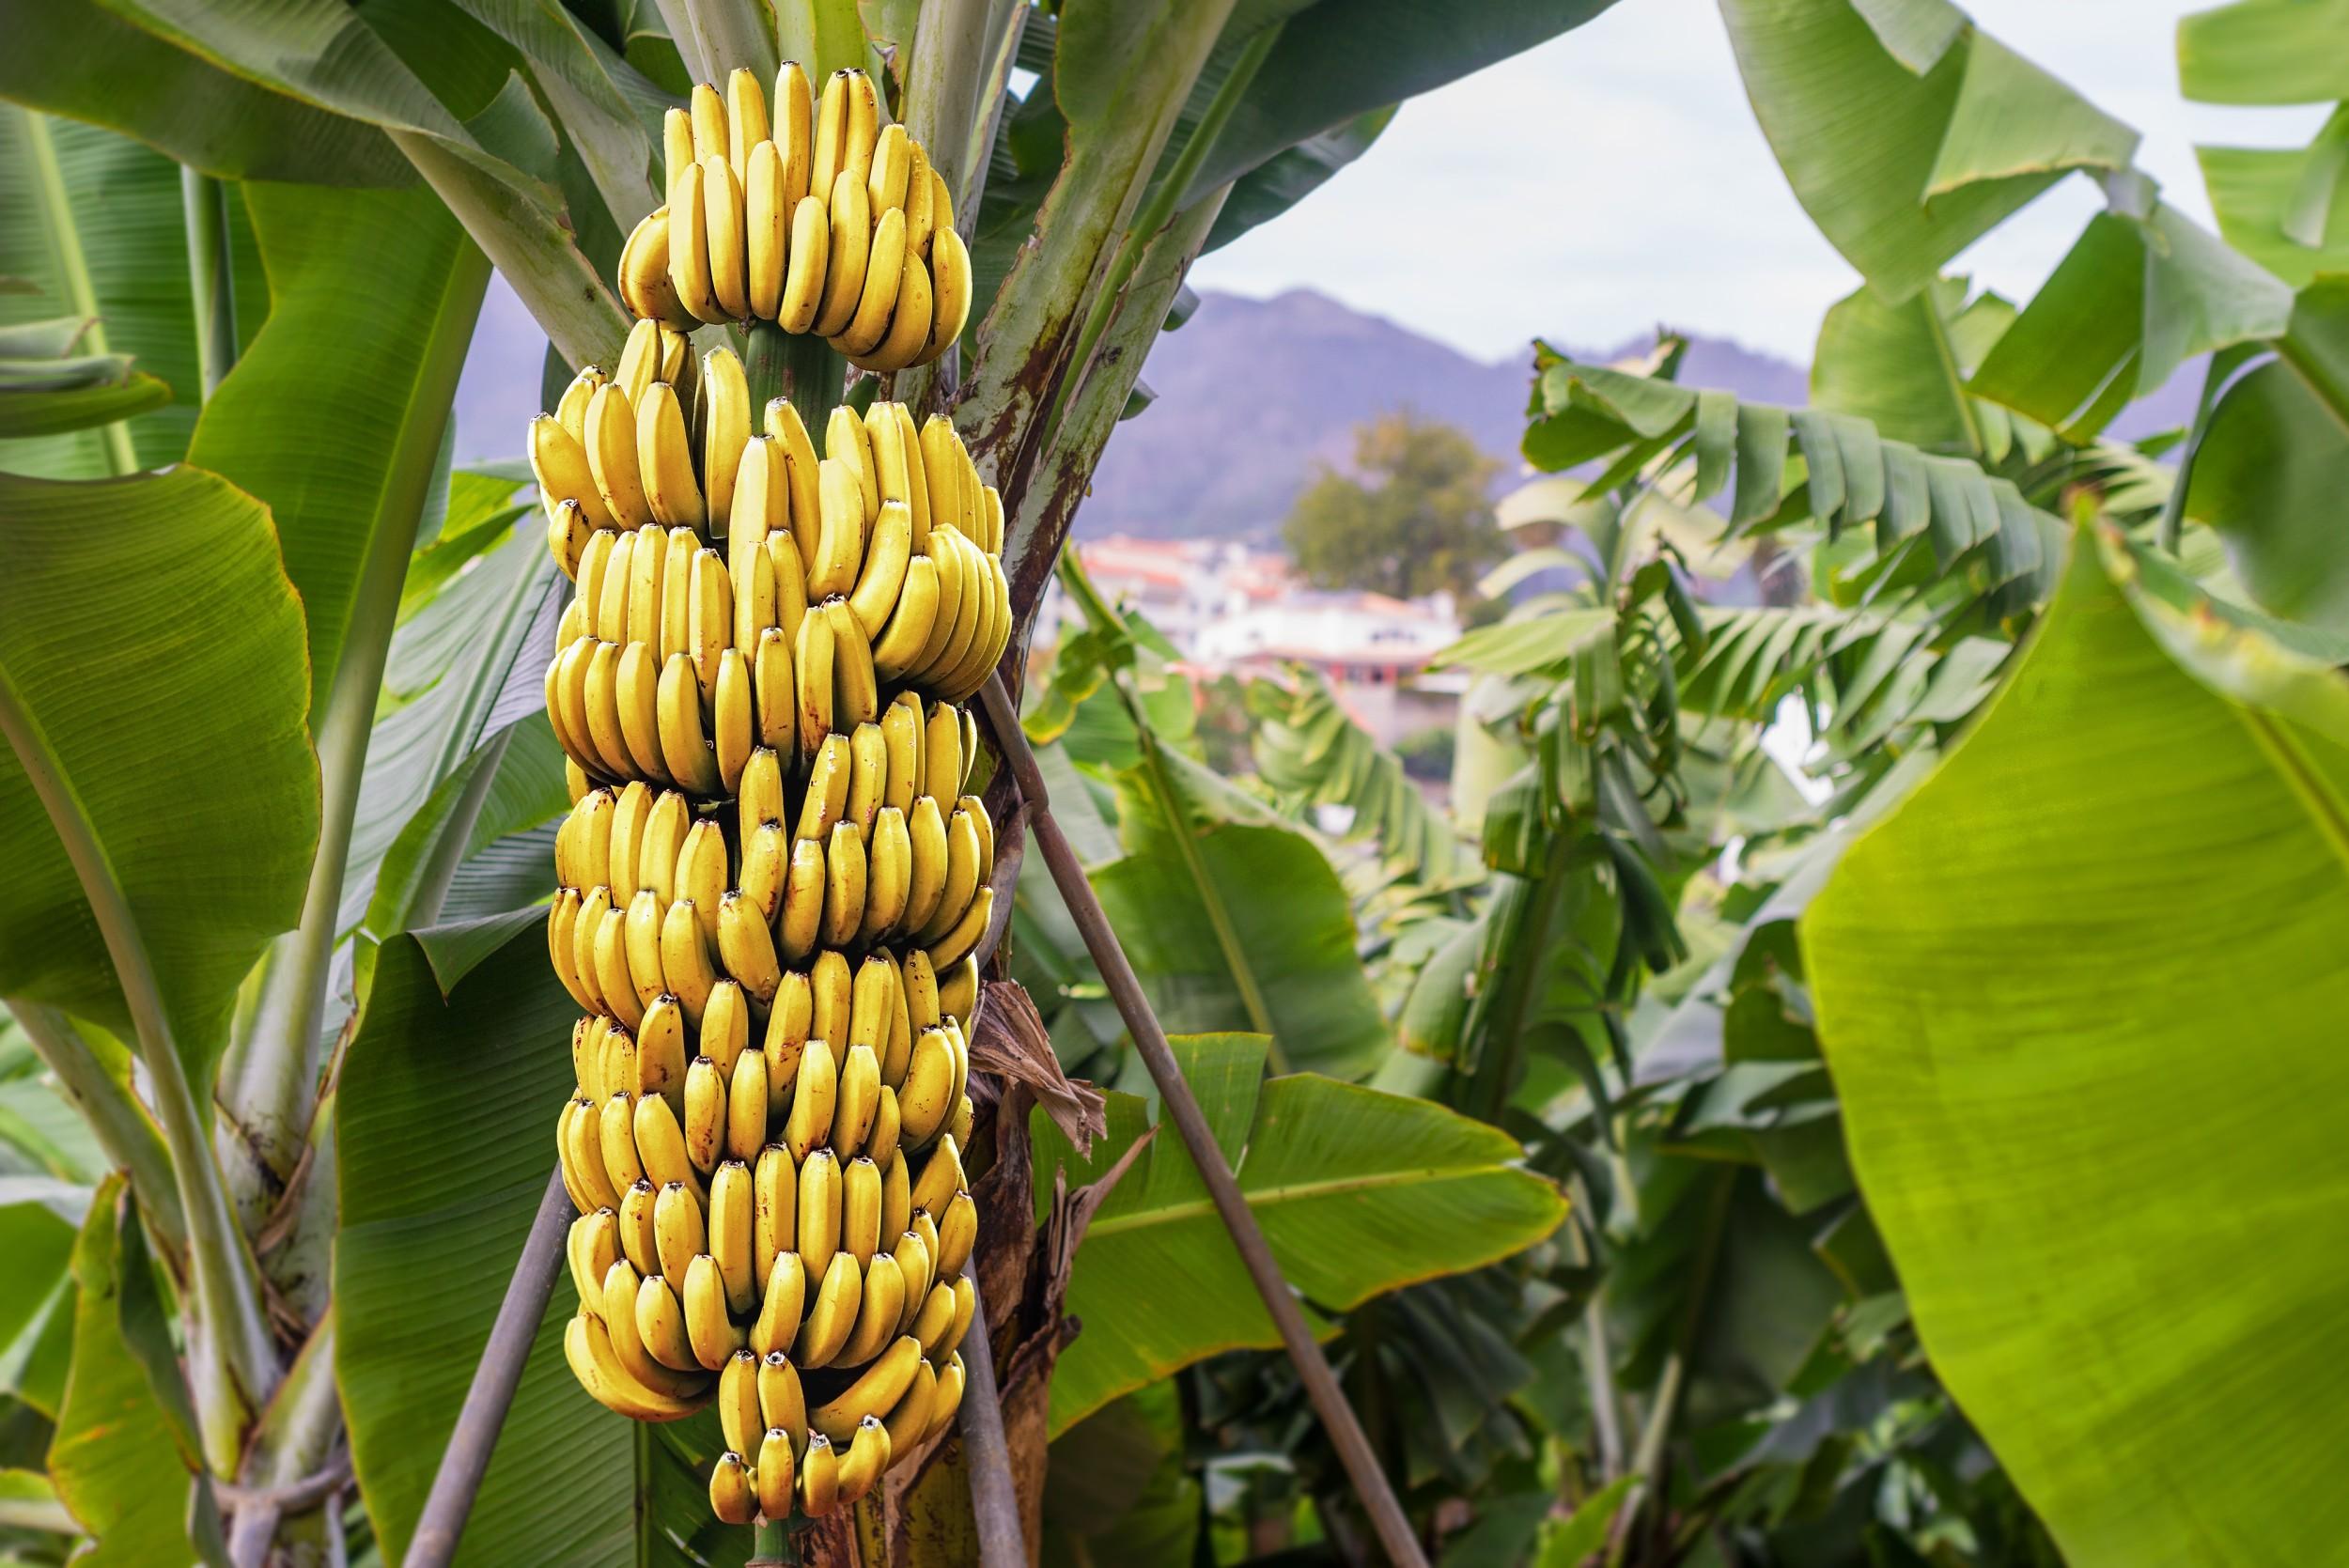 banana nutrientes e benef cios para a sa de frutas infoescola. Black Bedroom Furniture Sets. Home Design Ideas